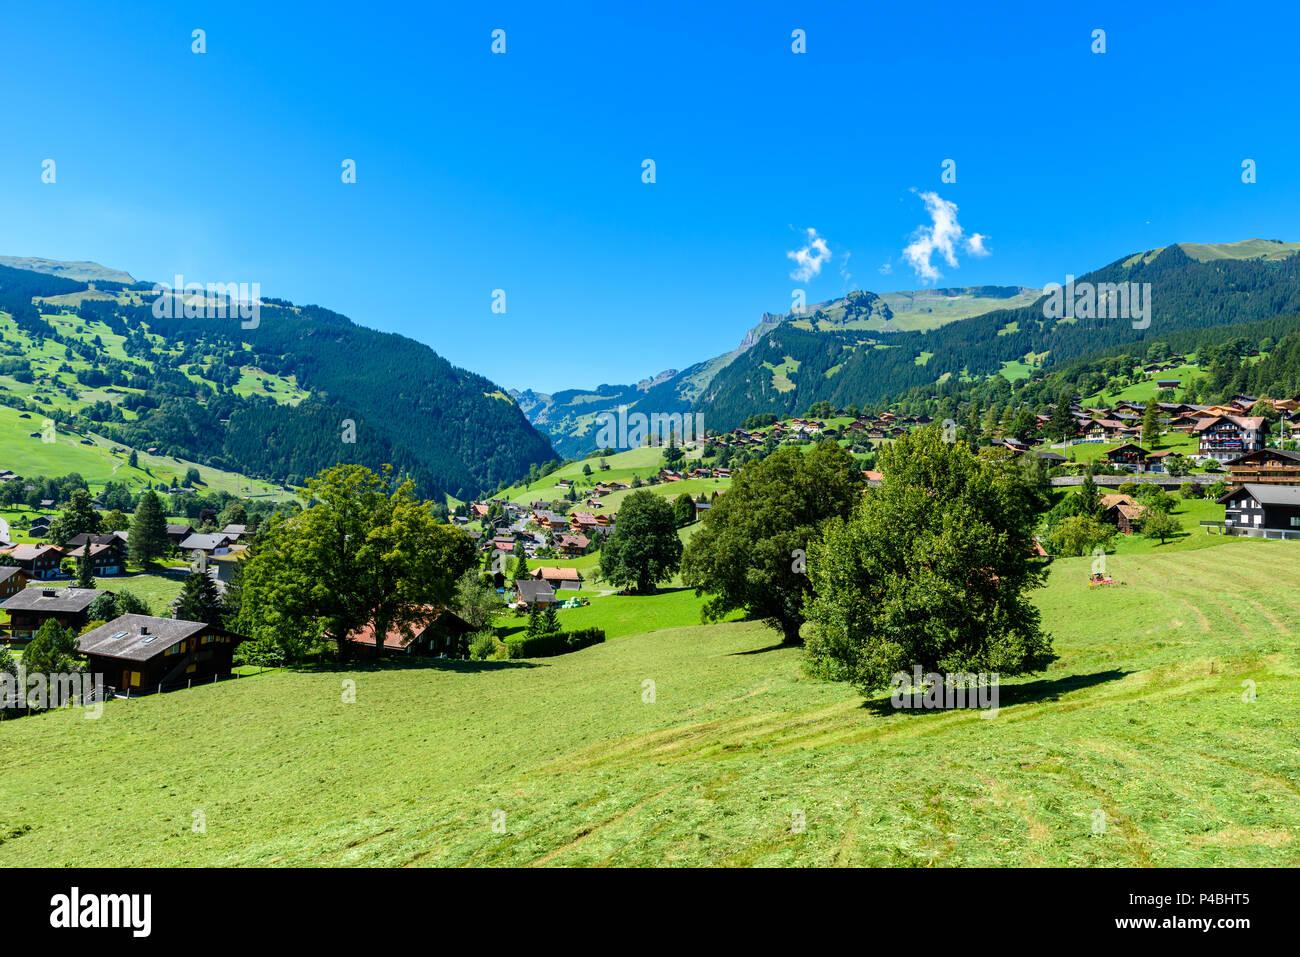 Grindelwald Beautiful Village In Mountain Scenery Switzerland